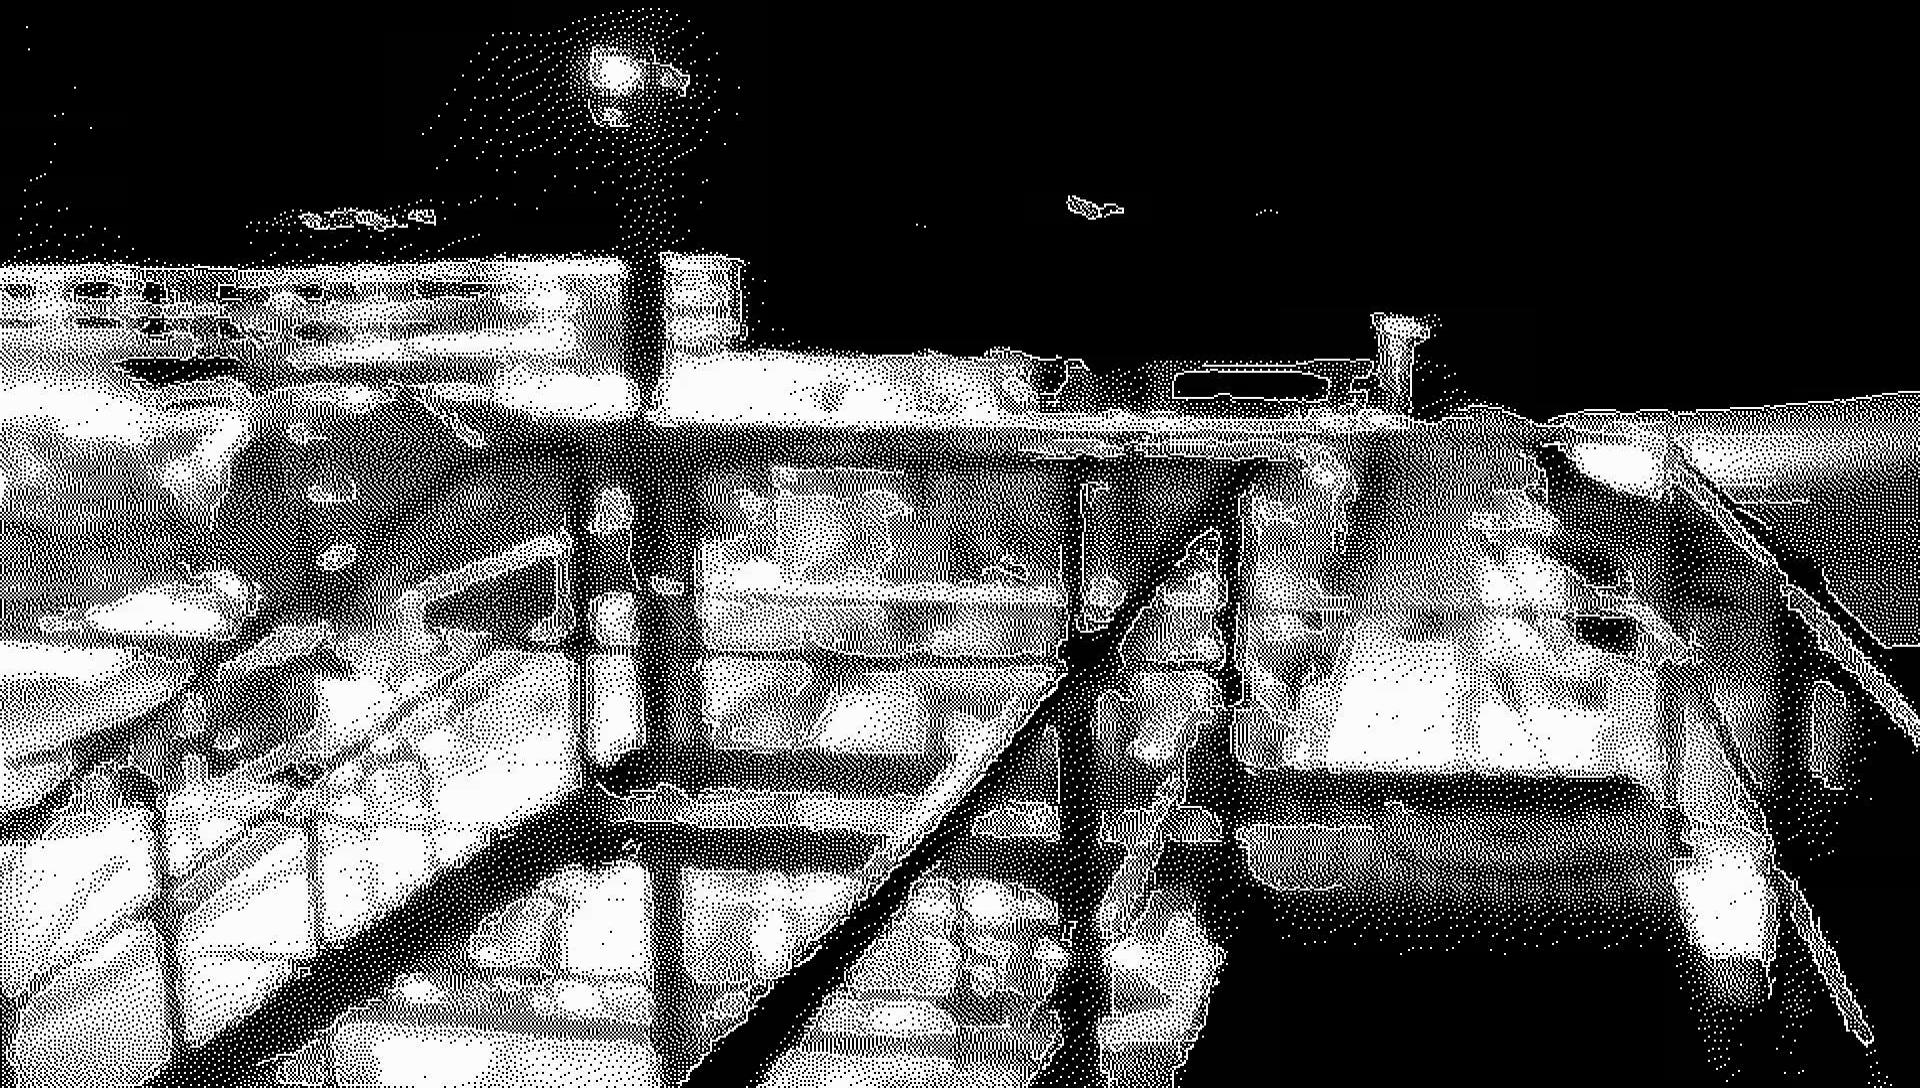 vlcsnap-2017-12-13-21h55m42s326.png